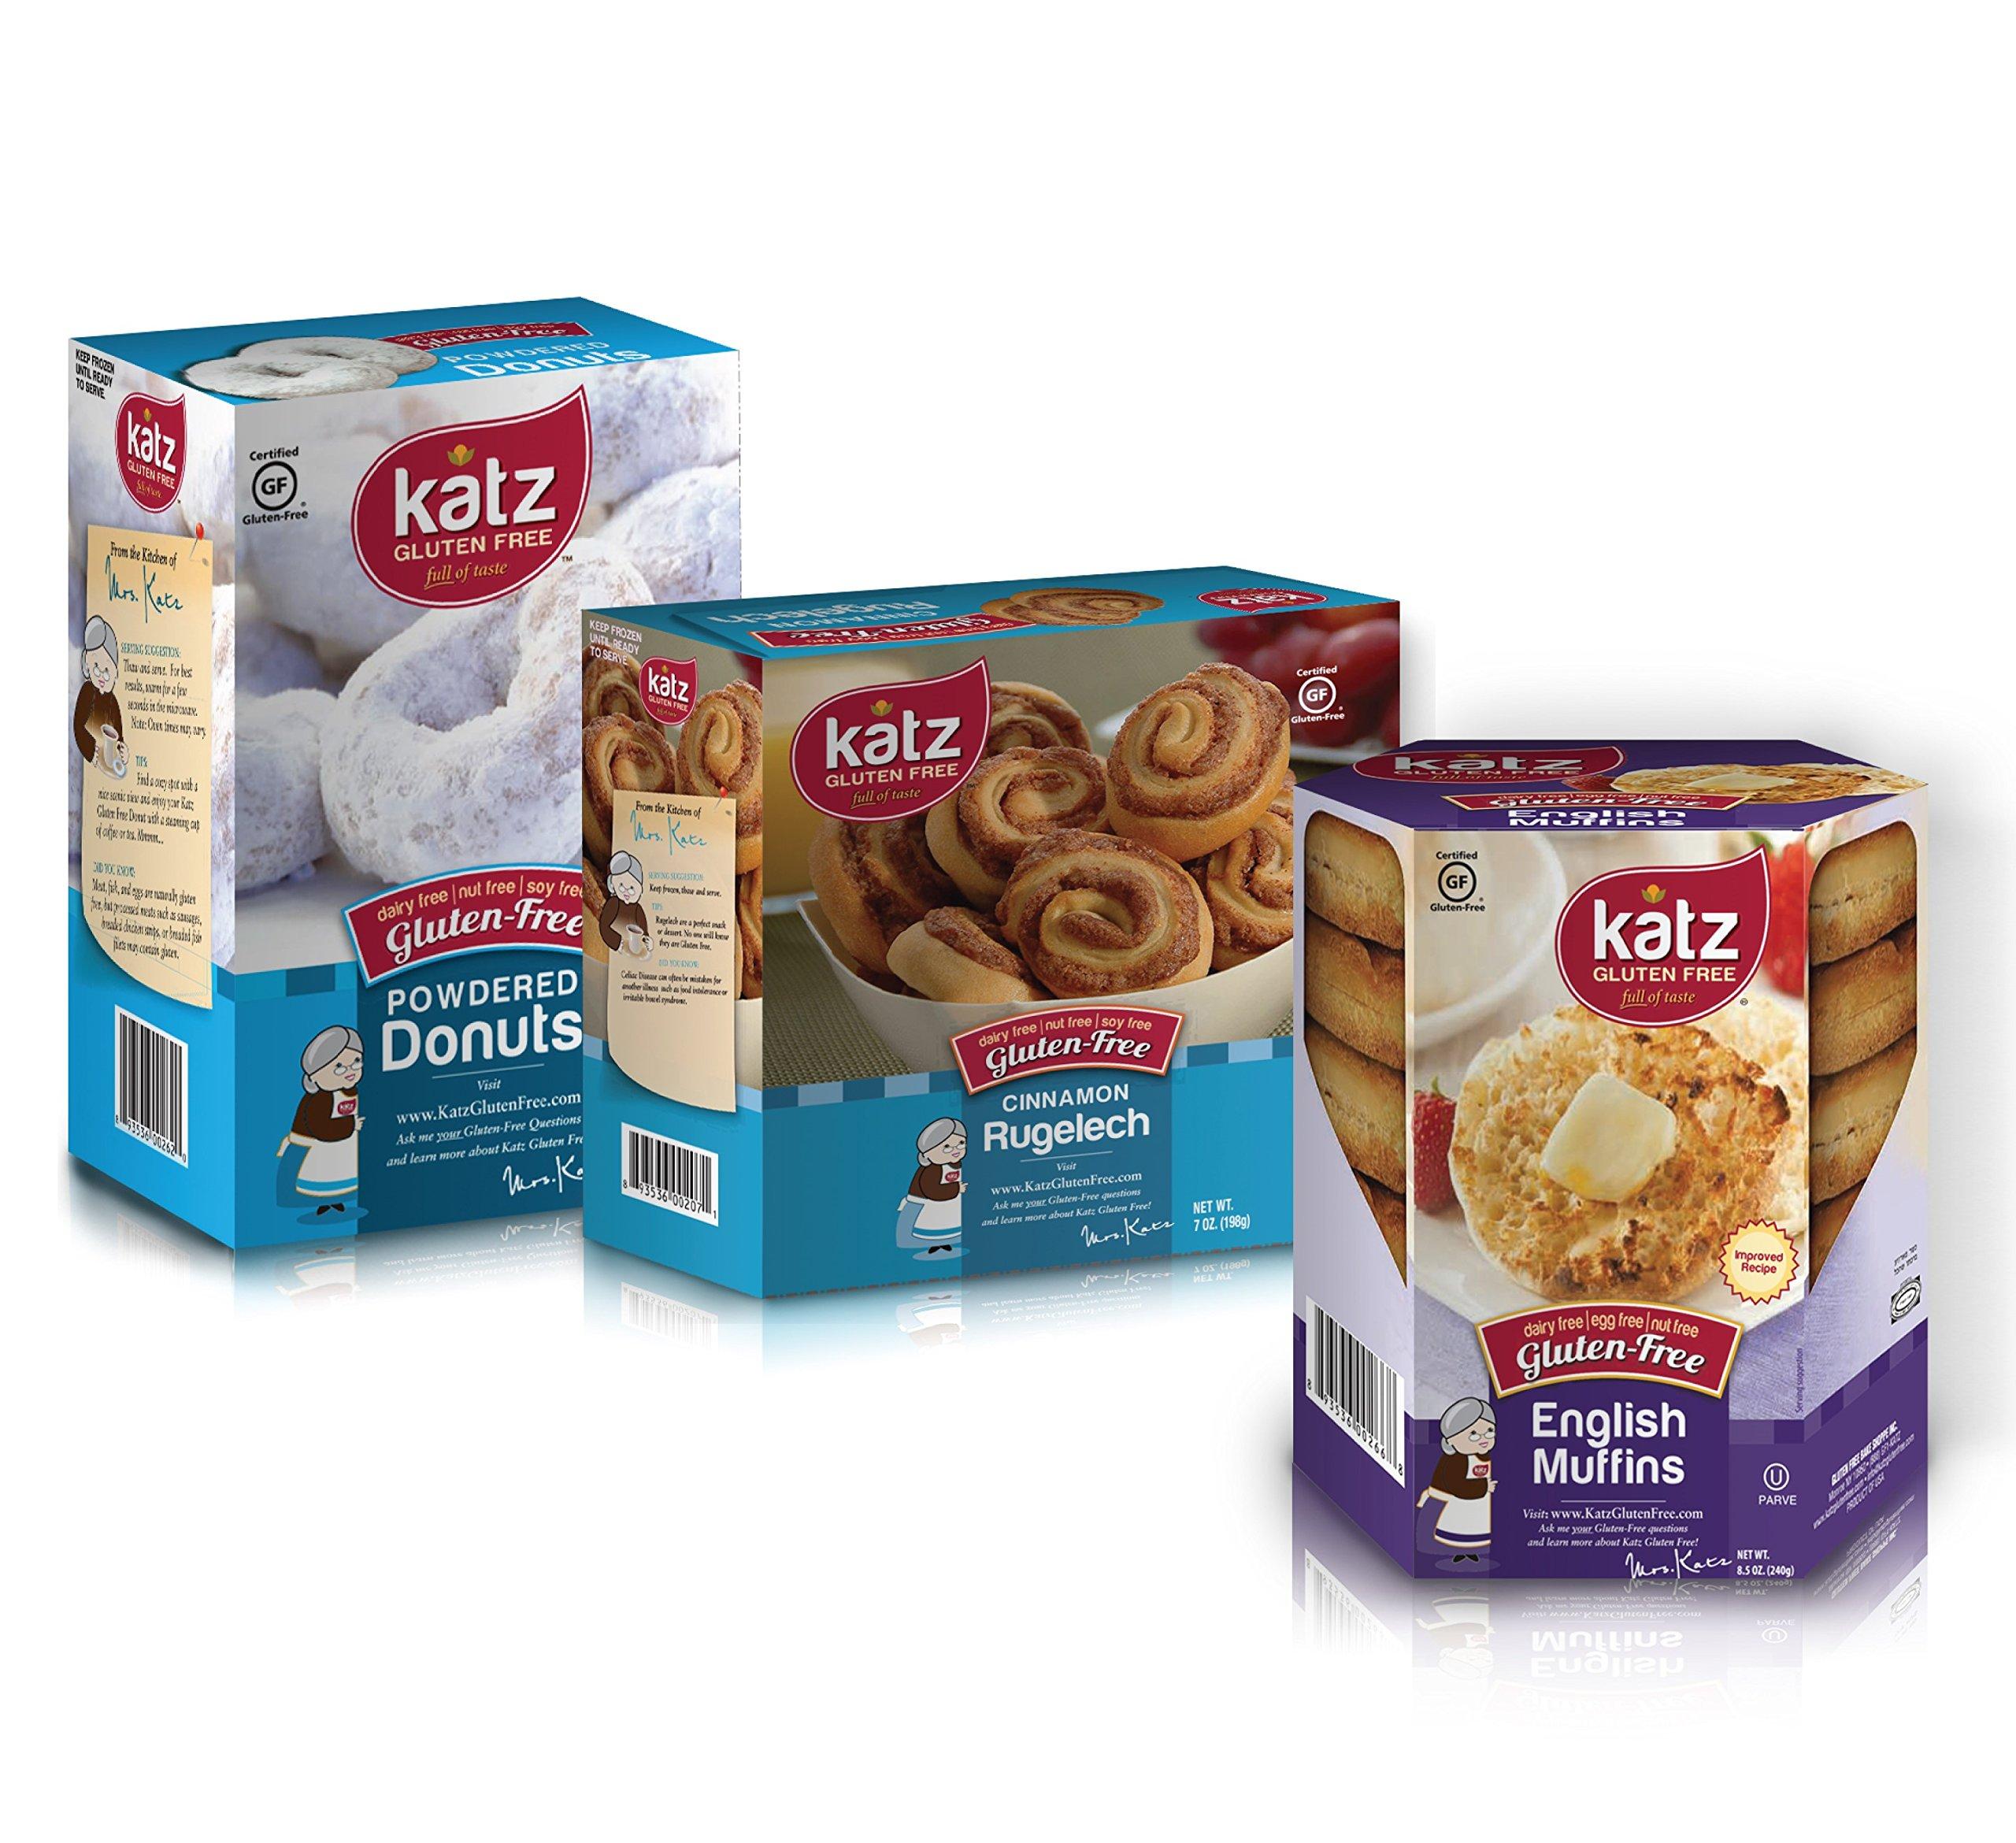 Katz Gluten Free Variety Pack   1 English Muffin, 1 Powdered Donut, 1 Cinnamon Rugelach   Dairy, Nut, Soy and Gluten Free   Kosher (1 Pack of each)